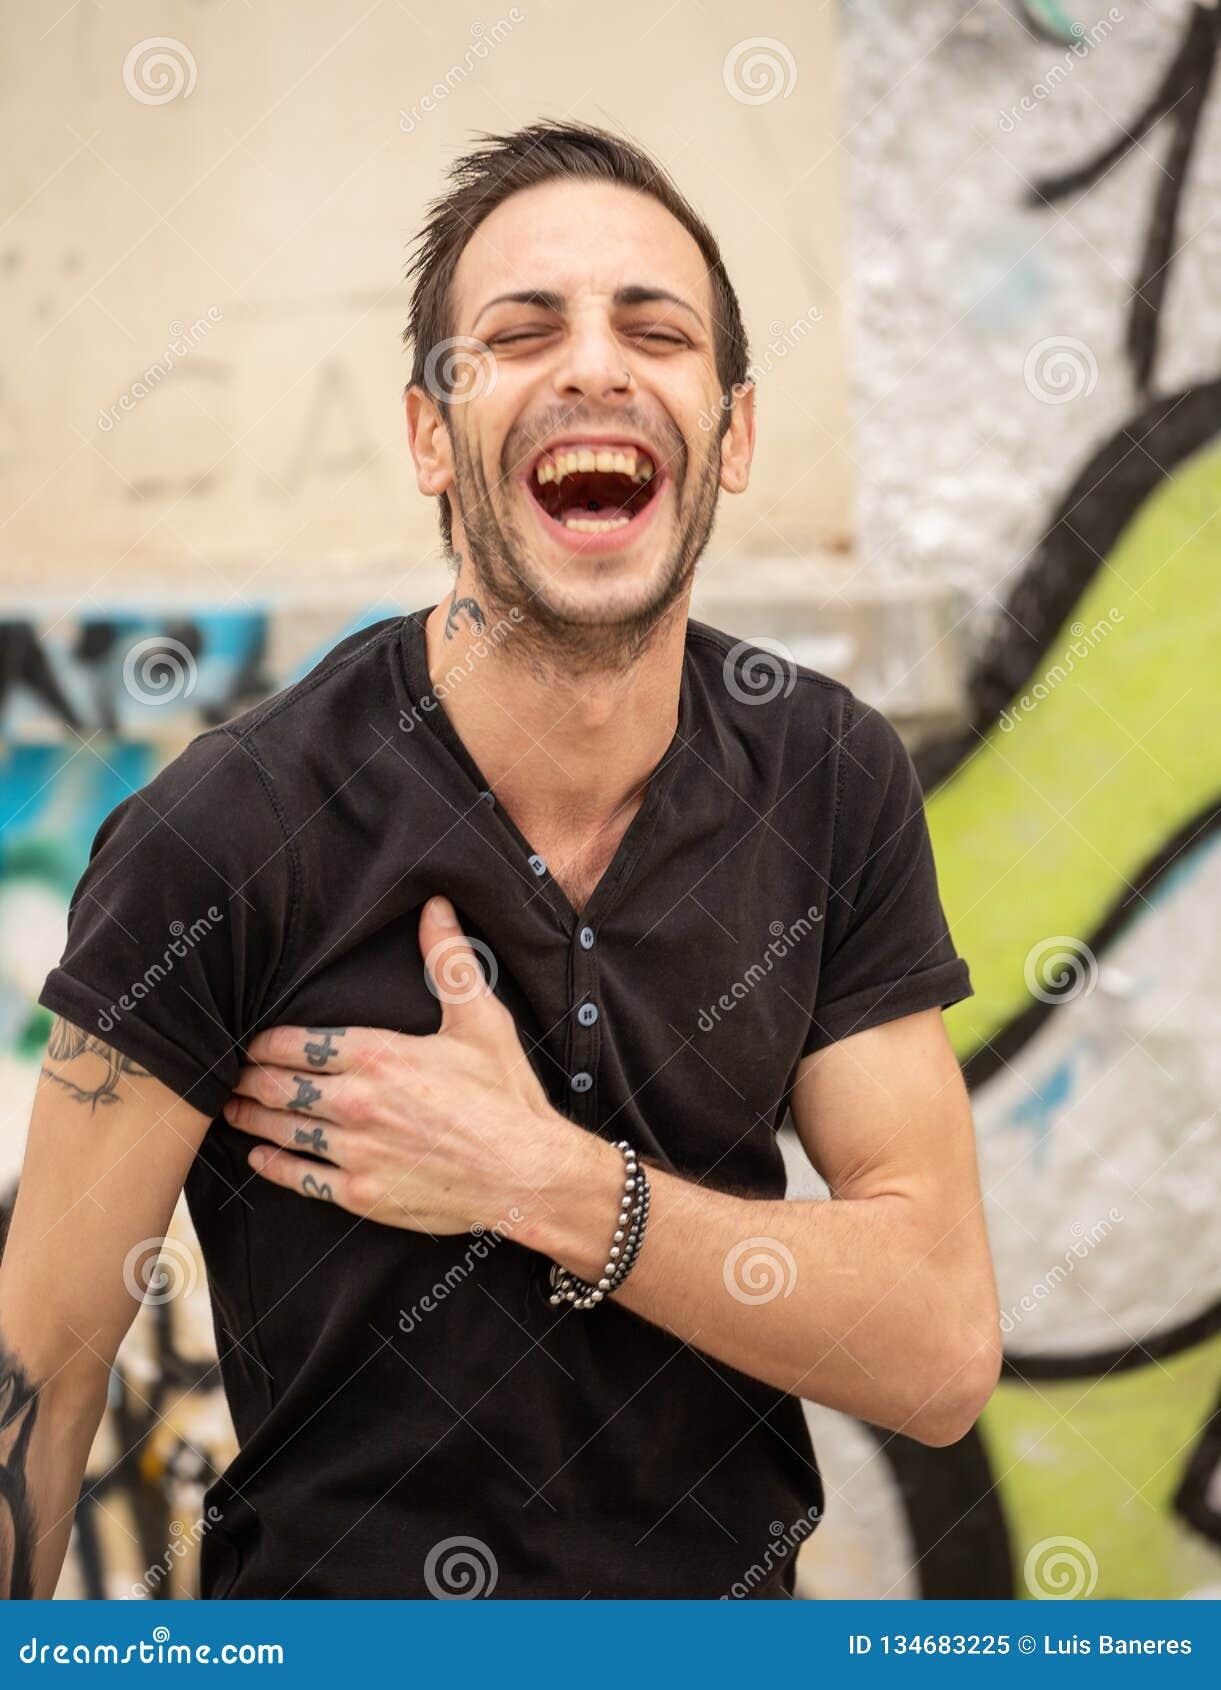 Fotografie van gelach en vreugde